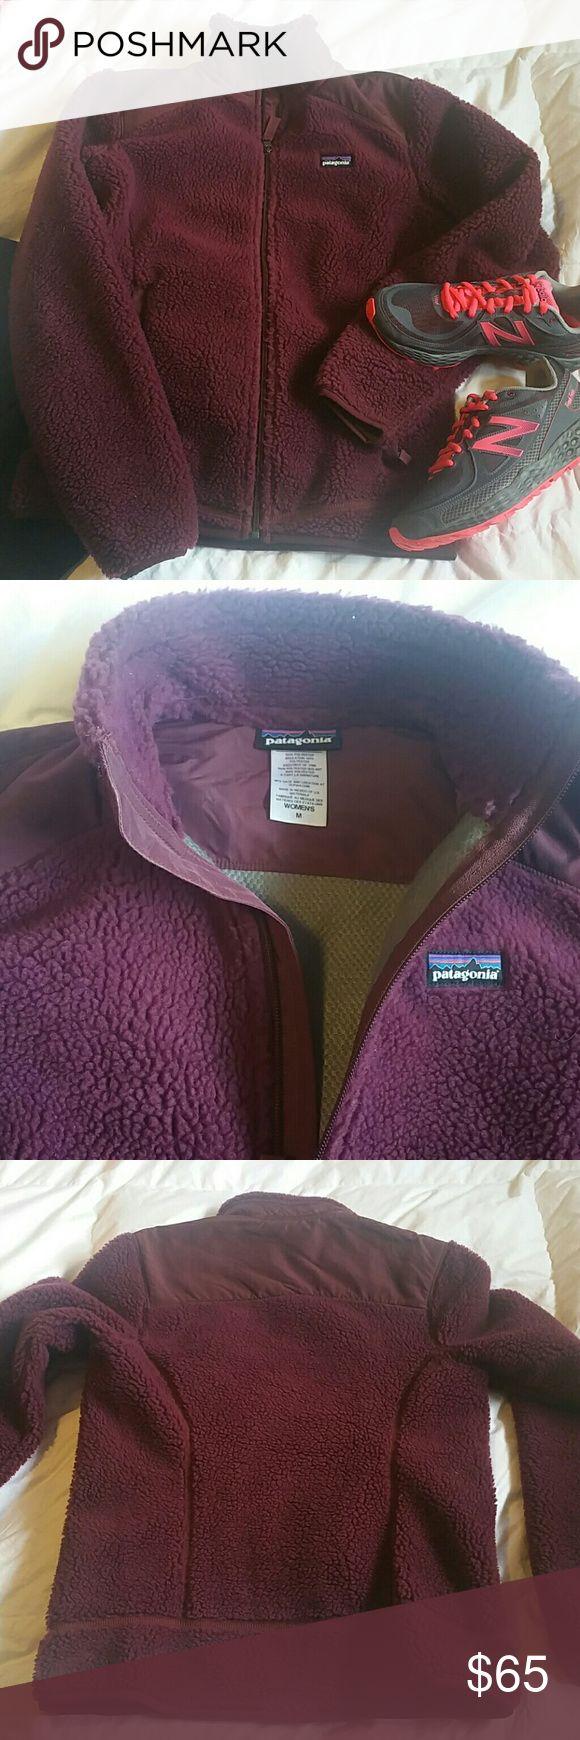 Patagonia Synchilla jacket Patagonia Synchilla jacket women's size medium, worn once! Patagonia Jackets & Coats